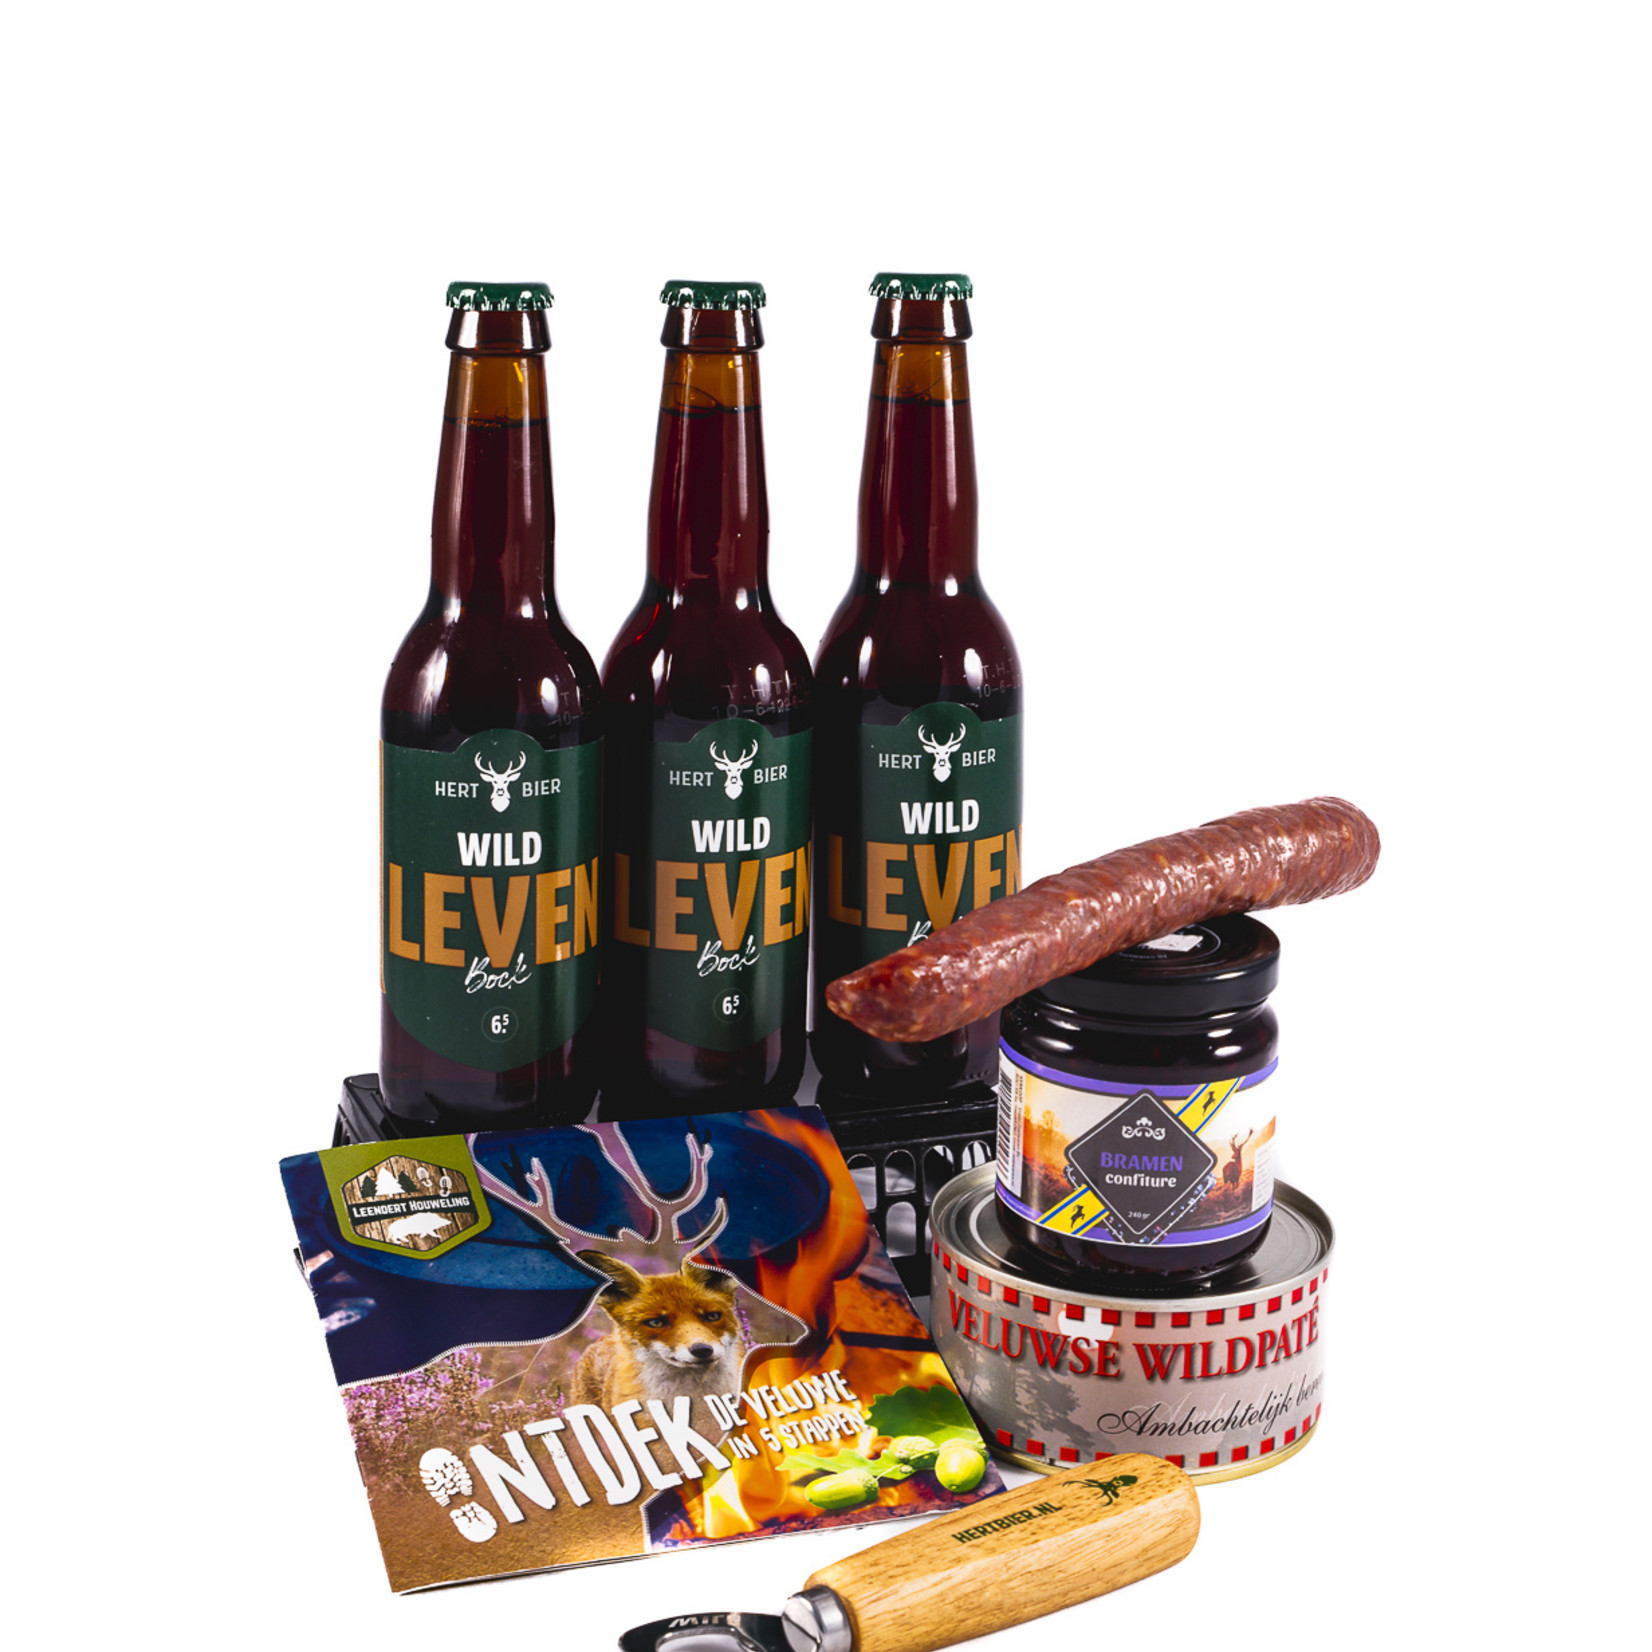 Hert Bier Beers and bites basic  - Copy